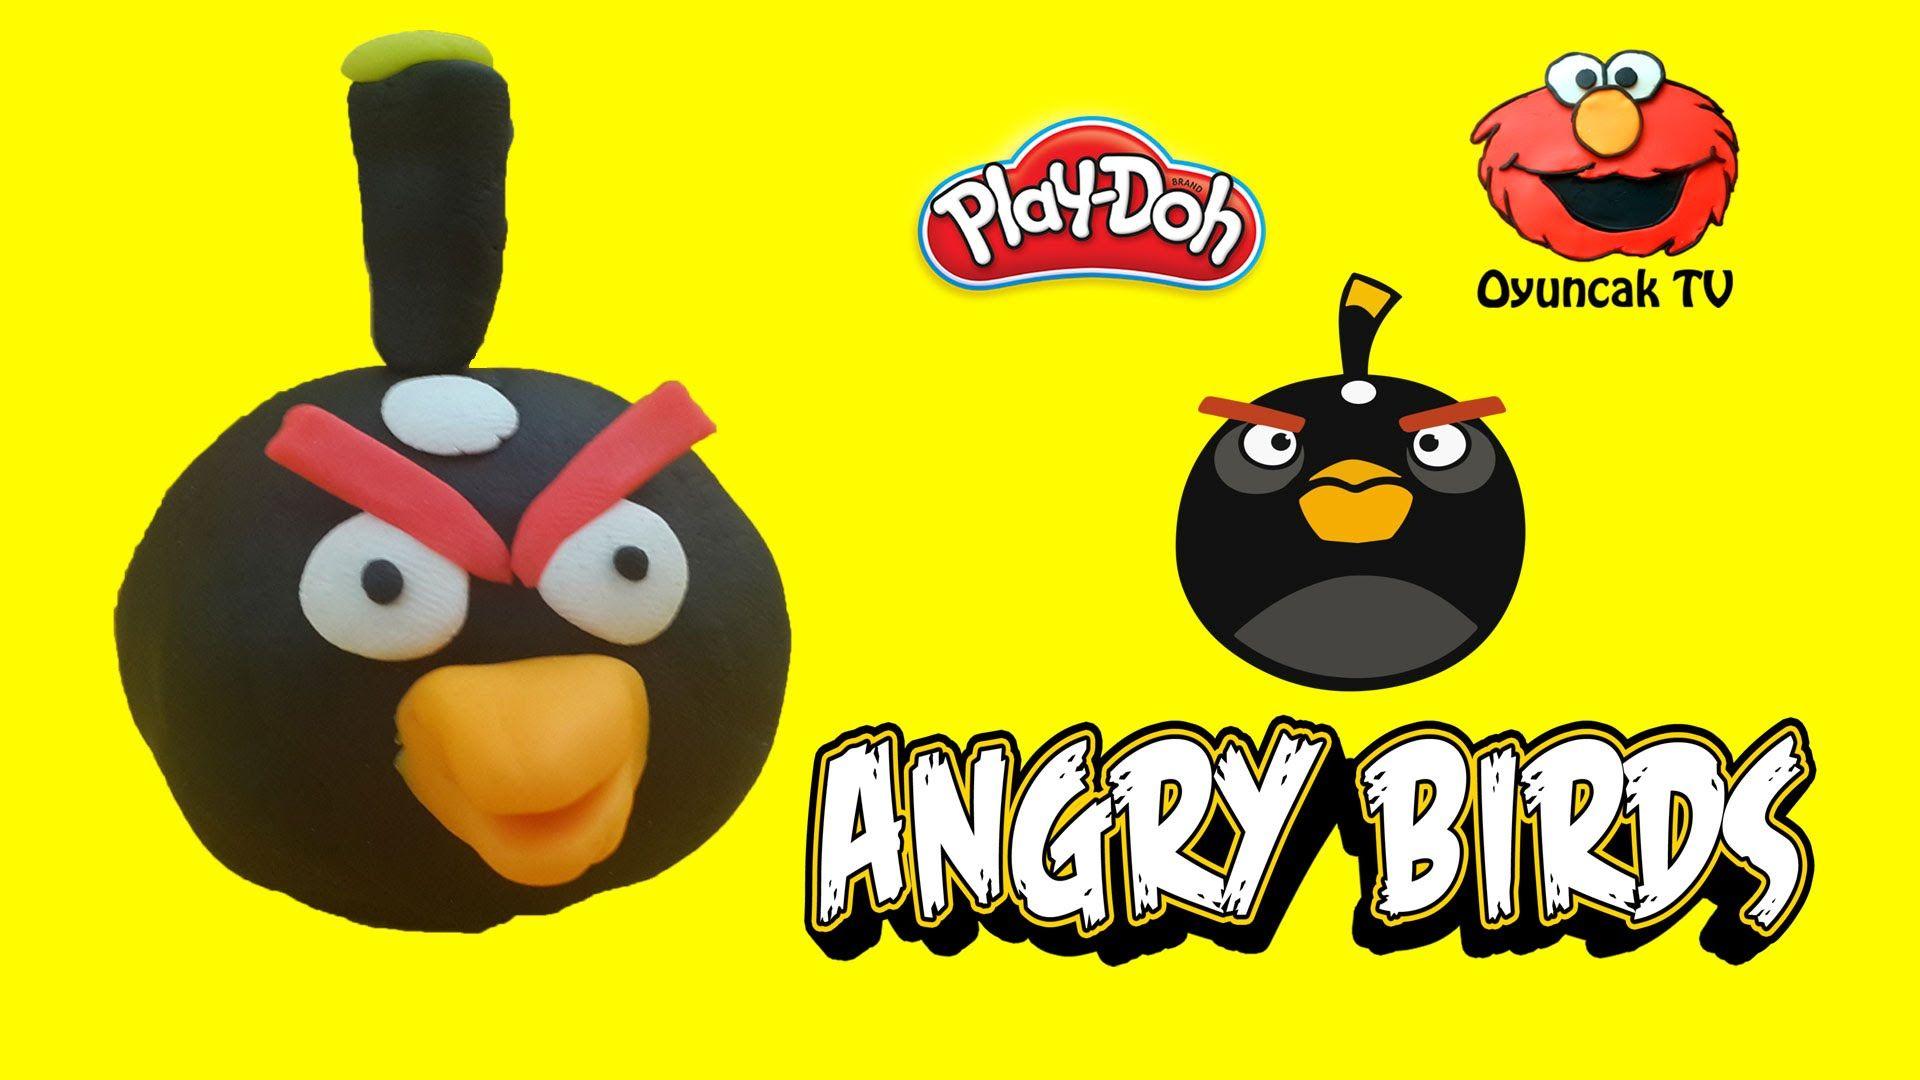 Angry Birds Siyah Kus Bomb Play Doh Oyun Hamuru Ile Yapimi Play Doh Angry Birds Oyun Hamuru